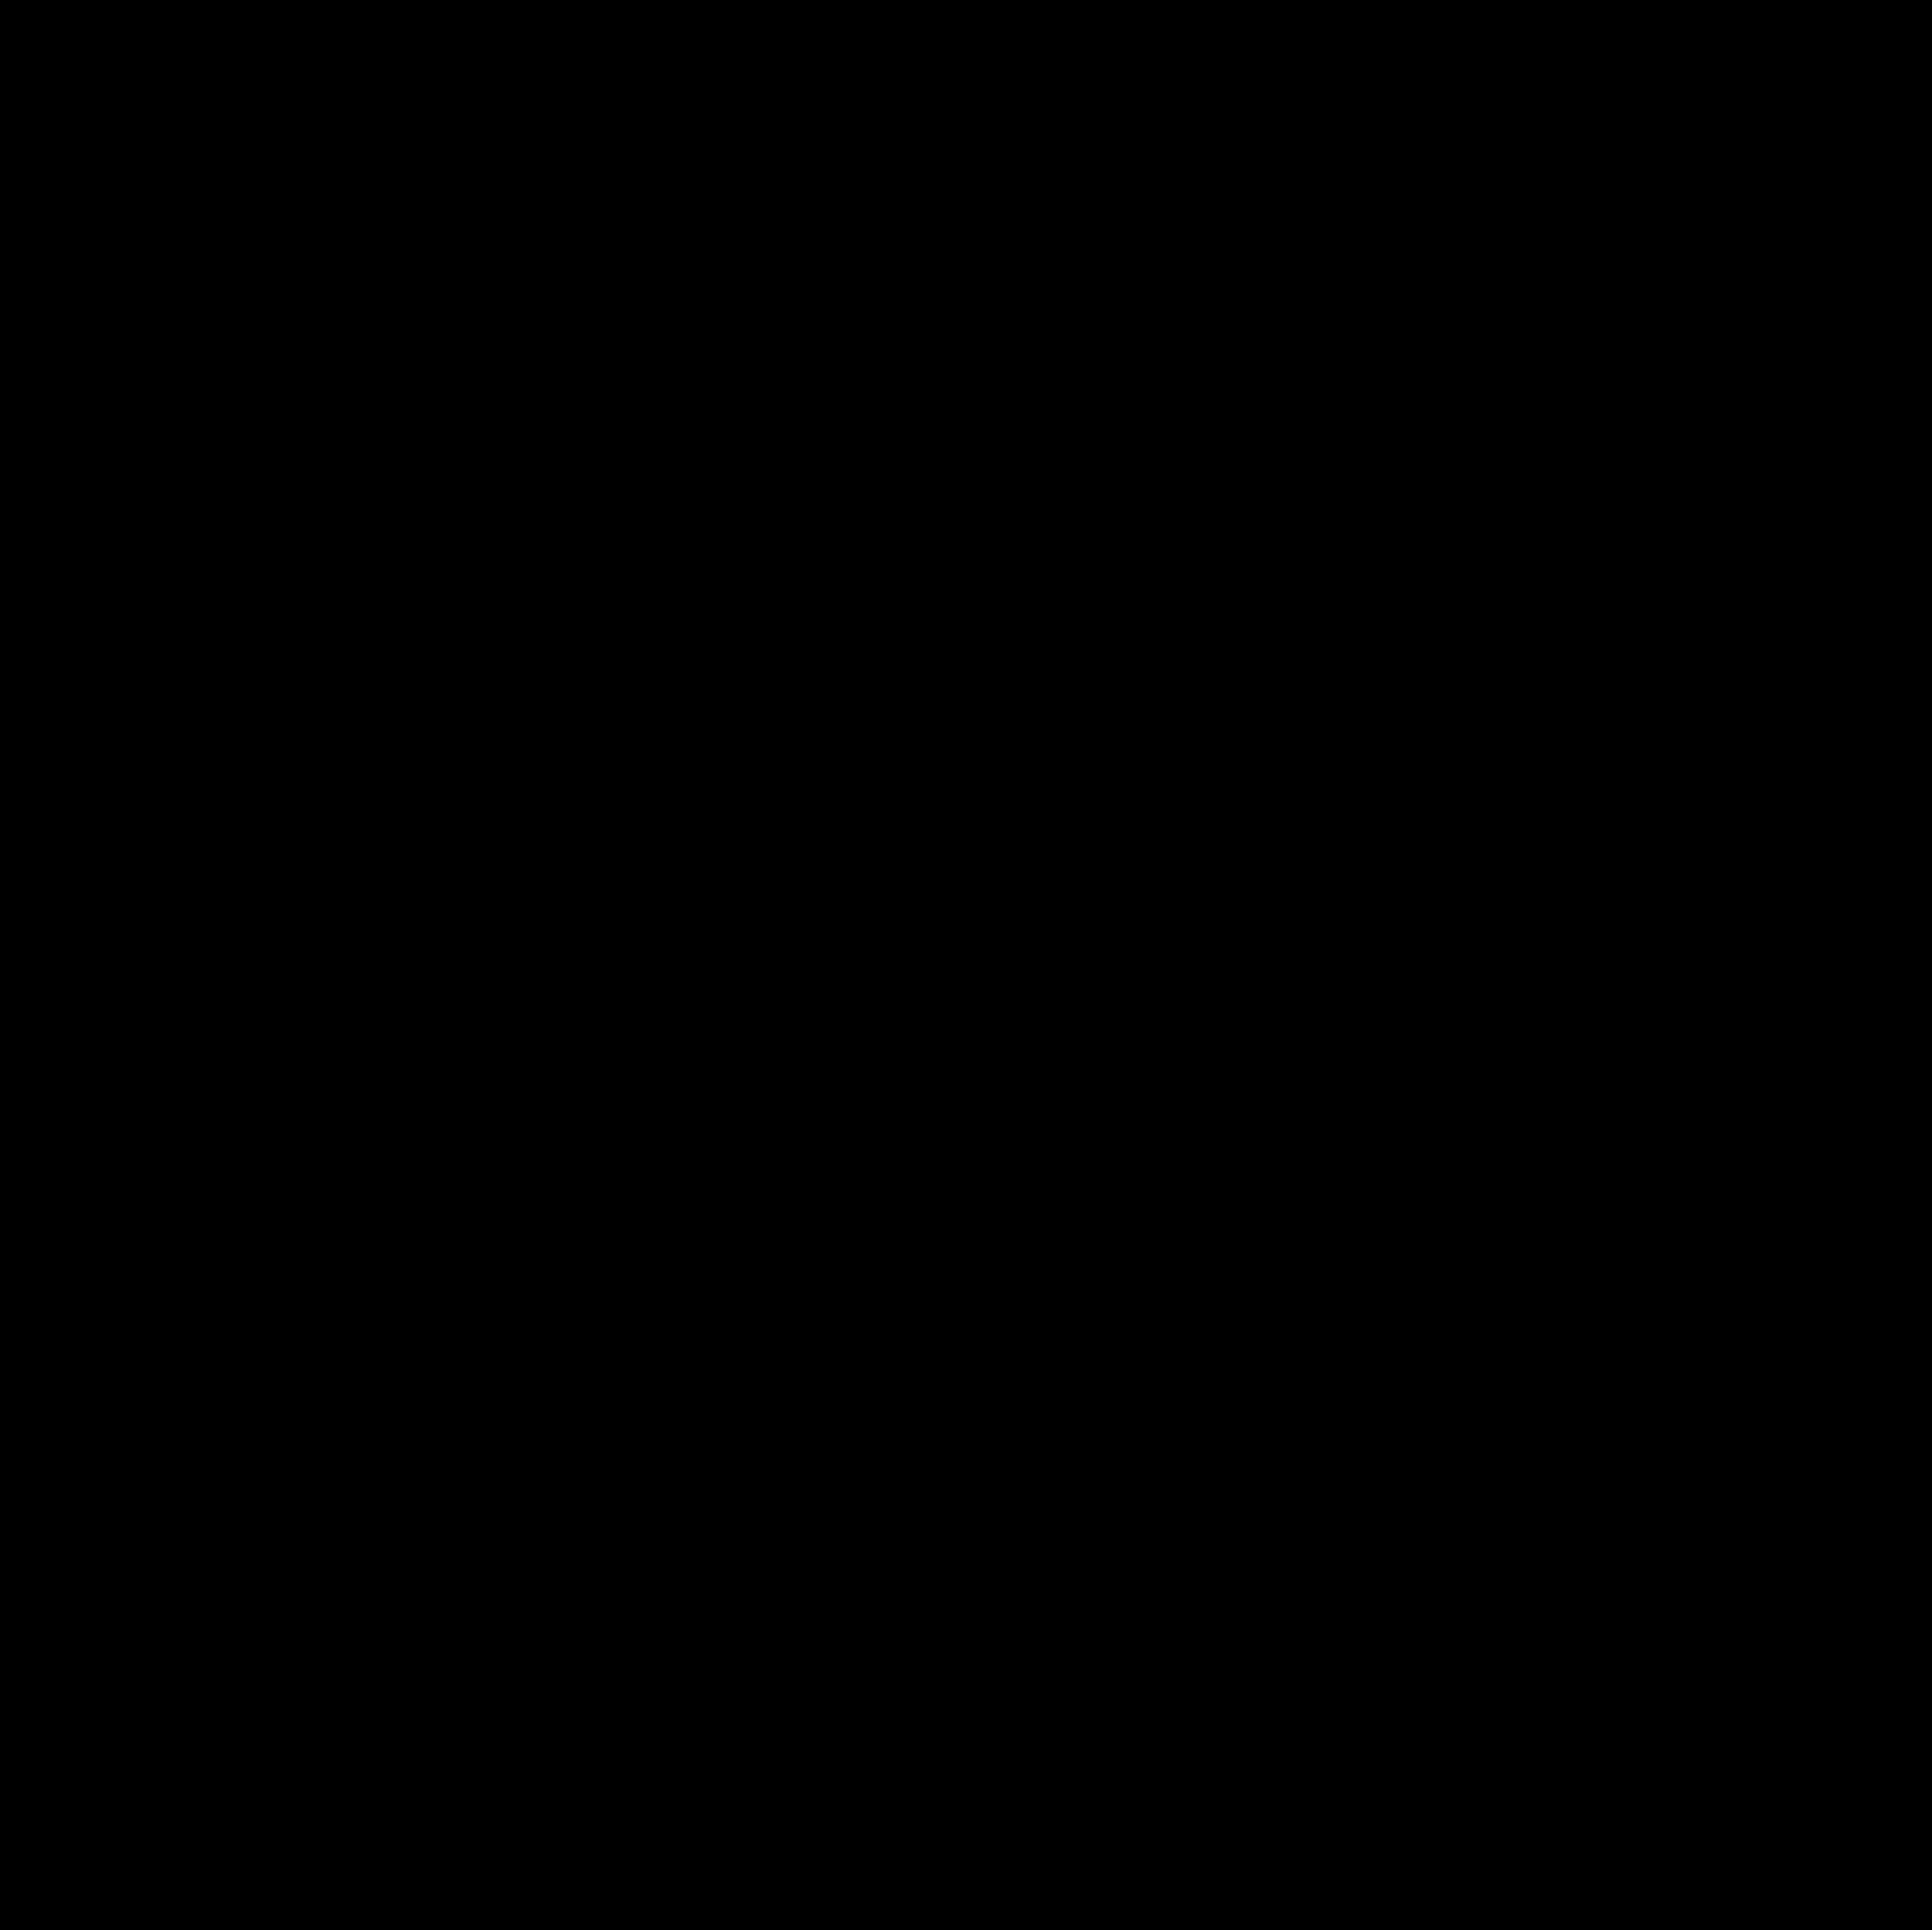 03-2-POST-RANDOM-QUOTE-HiejinYoo